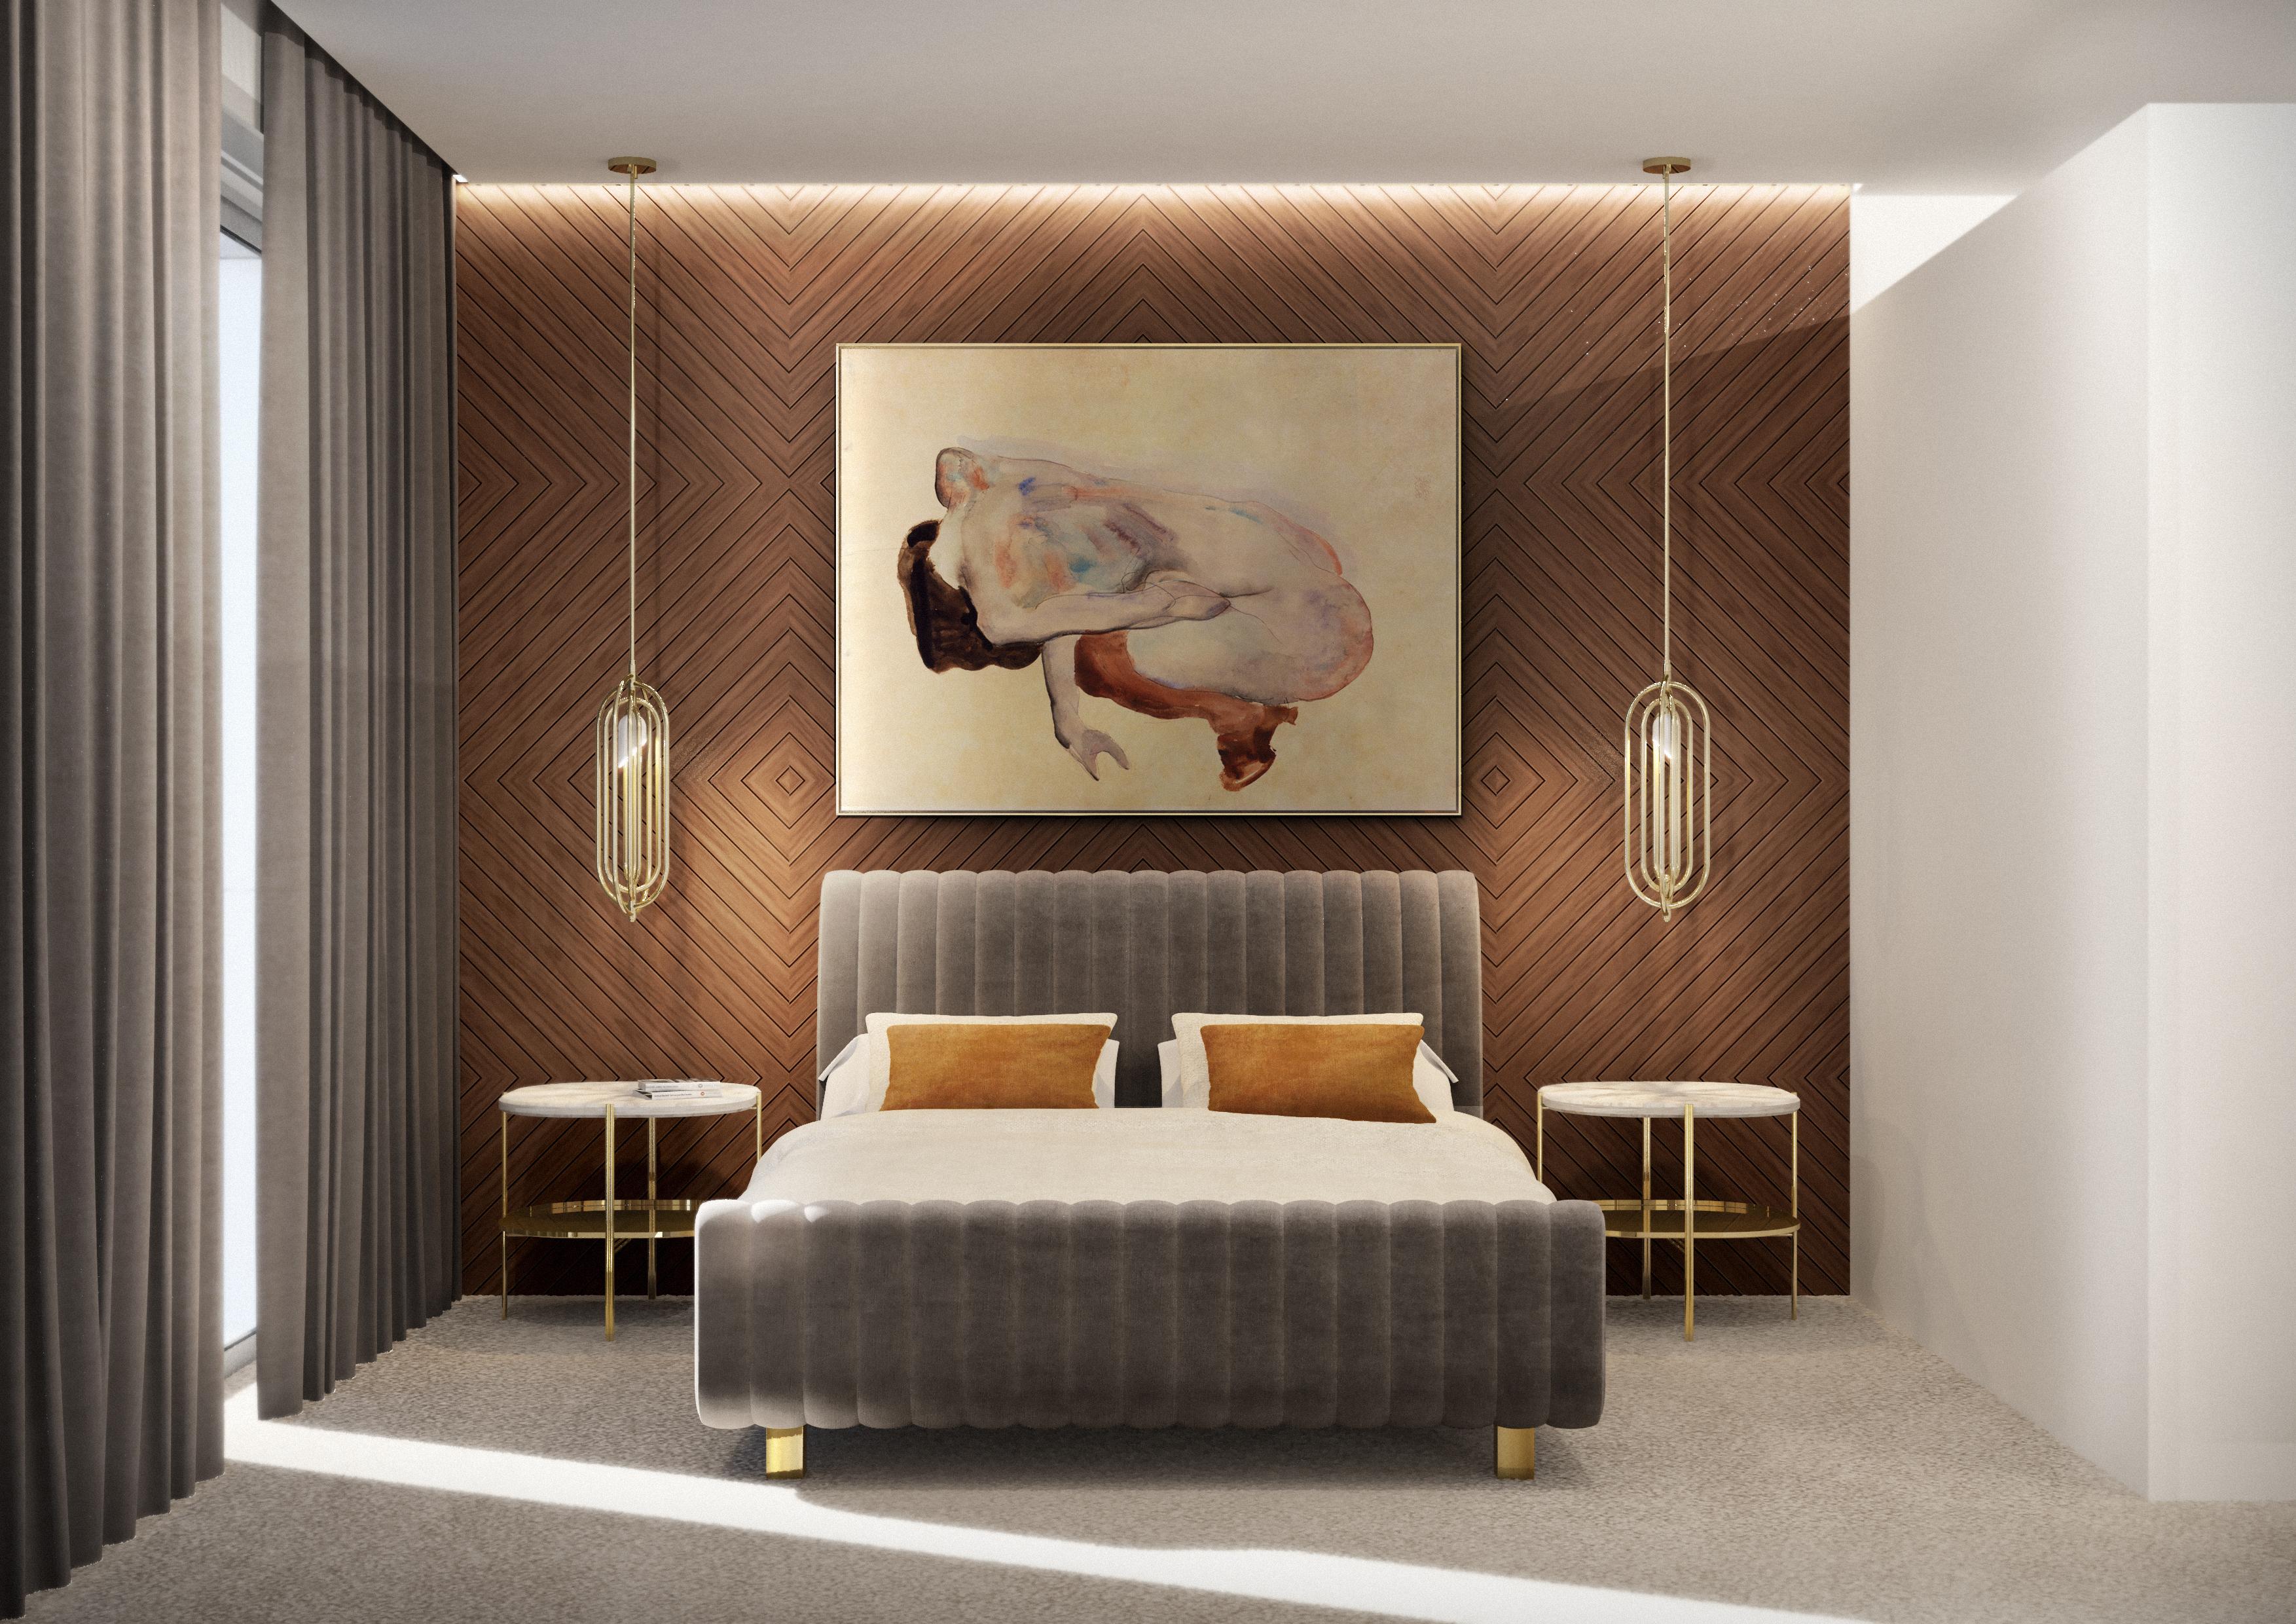 Summer Trends: 8 Mid-Century Modern Lamps for Bedroom Design